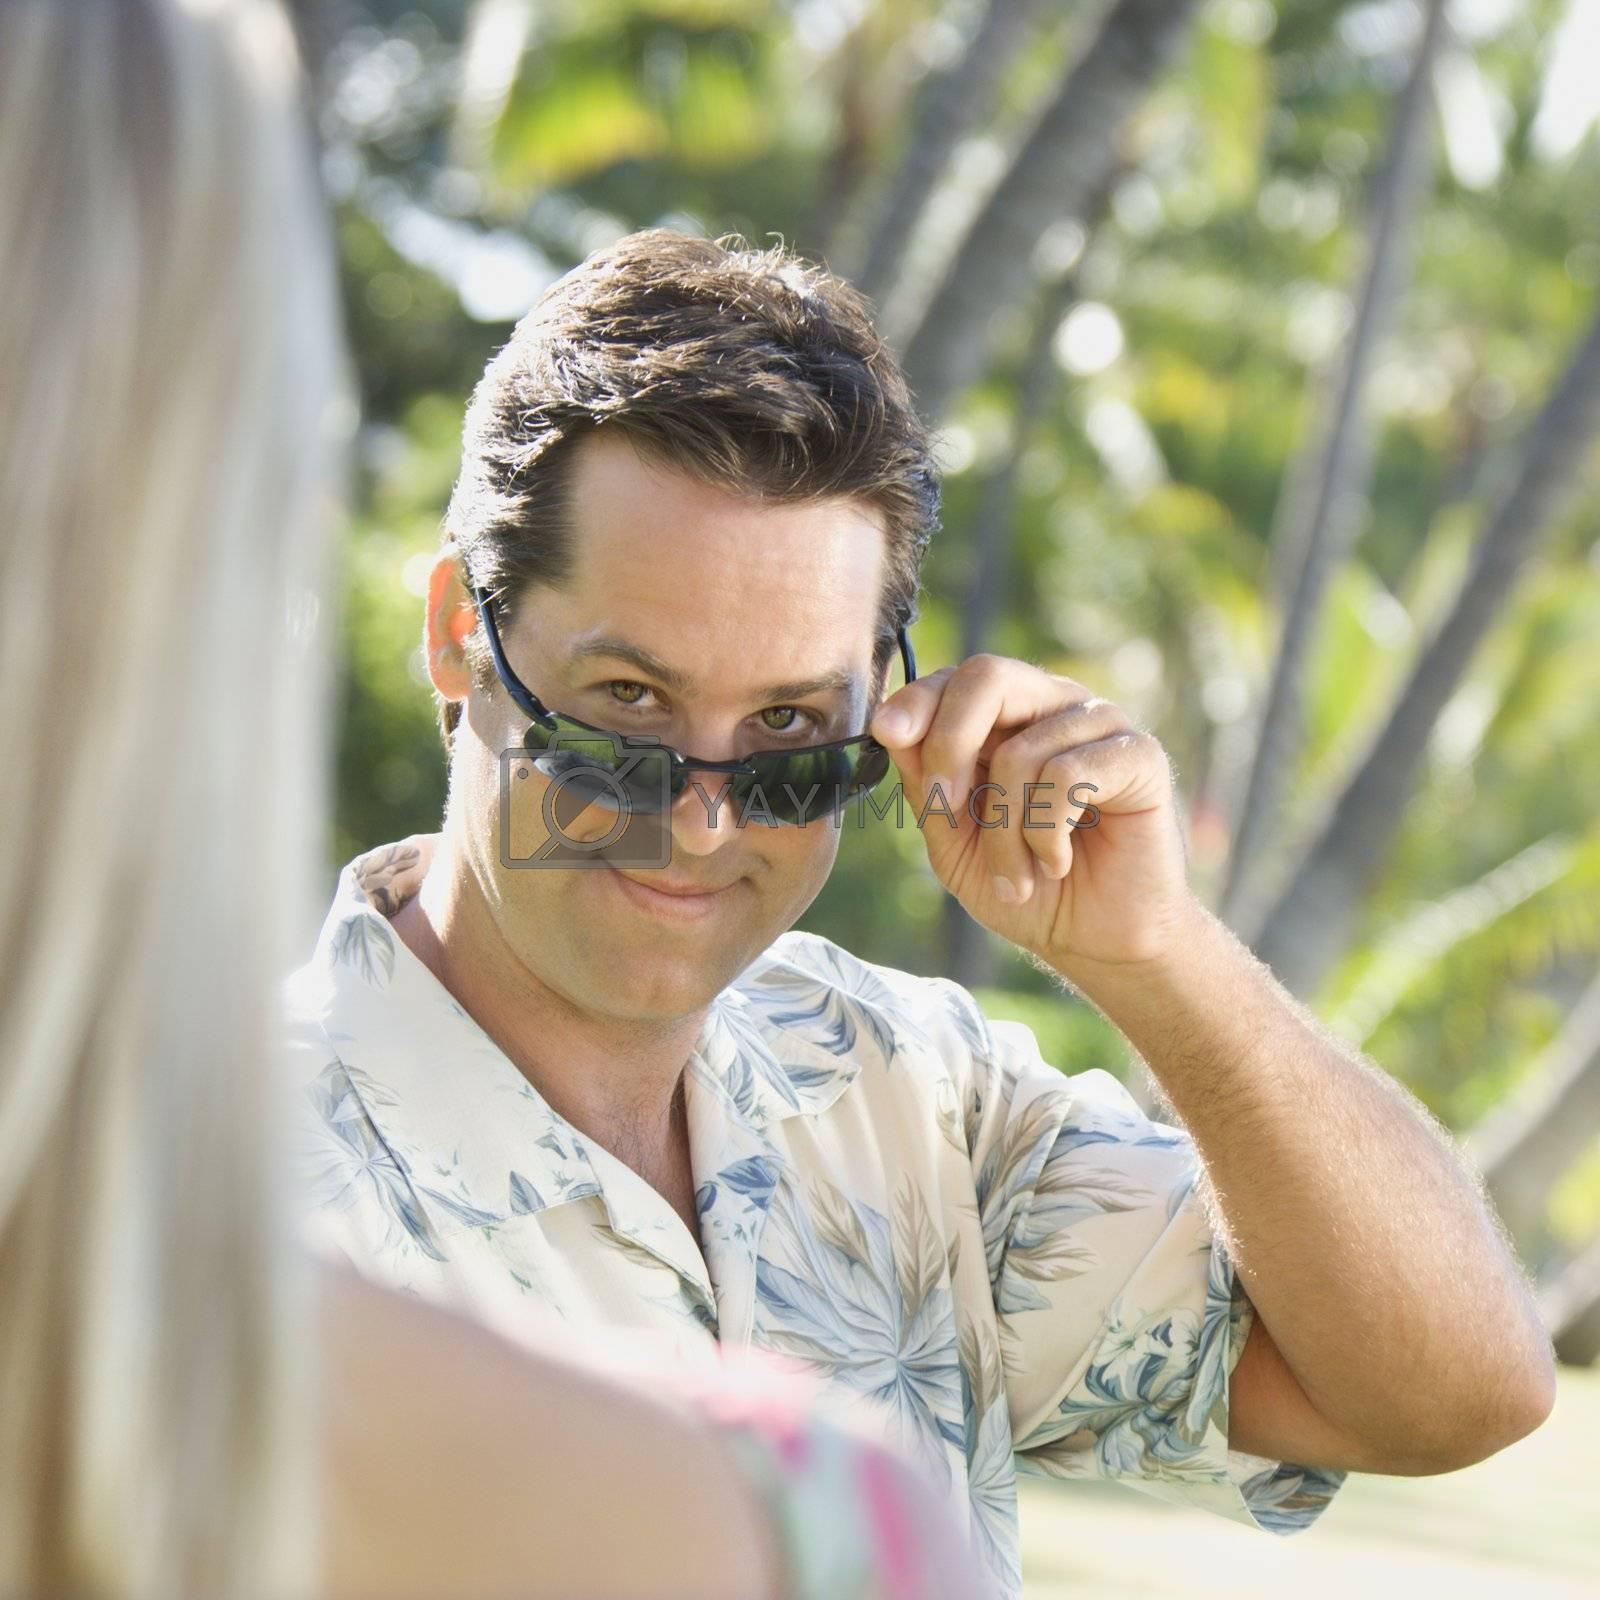 Caucasian mid adult man tilting sunglasses at woman.